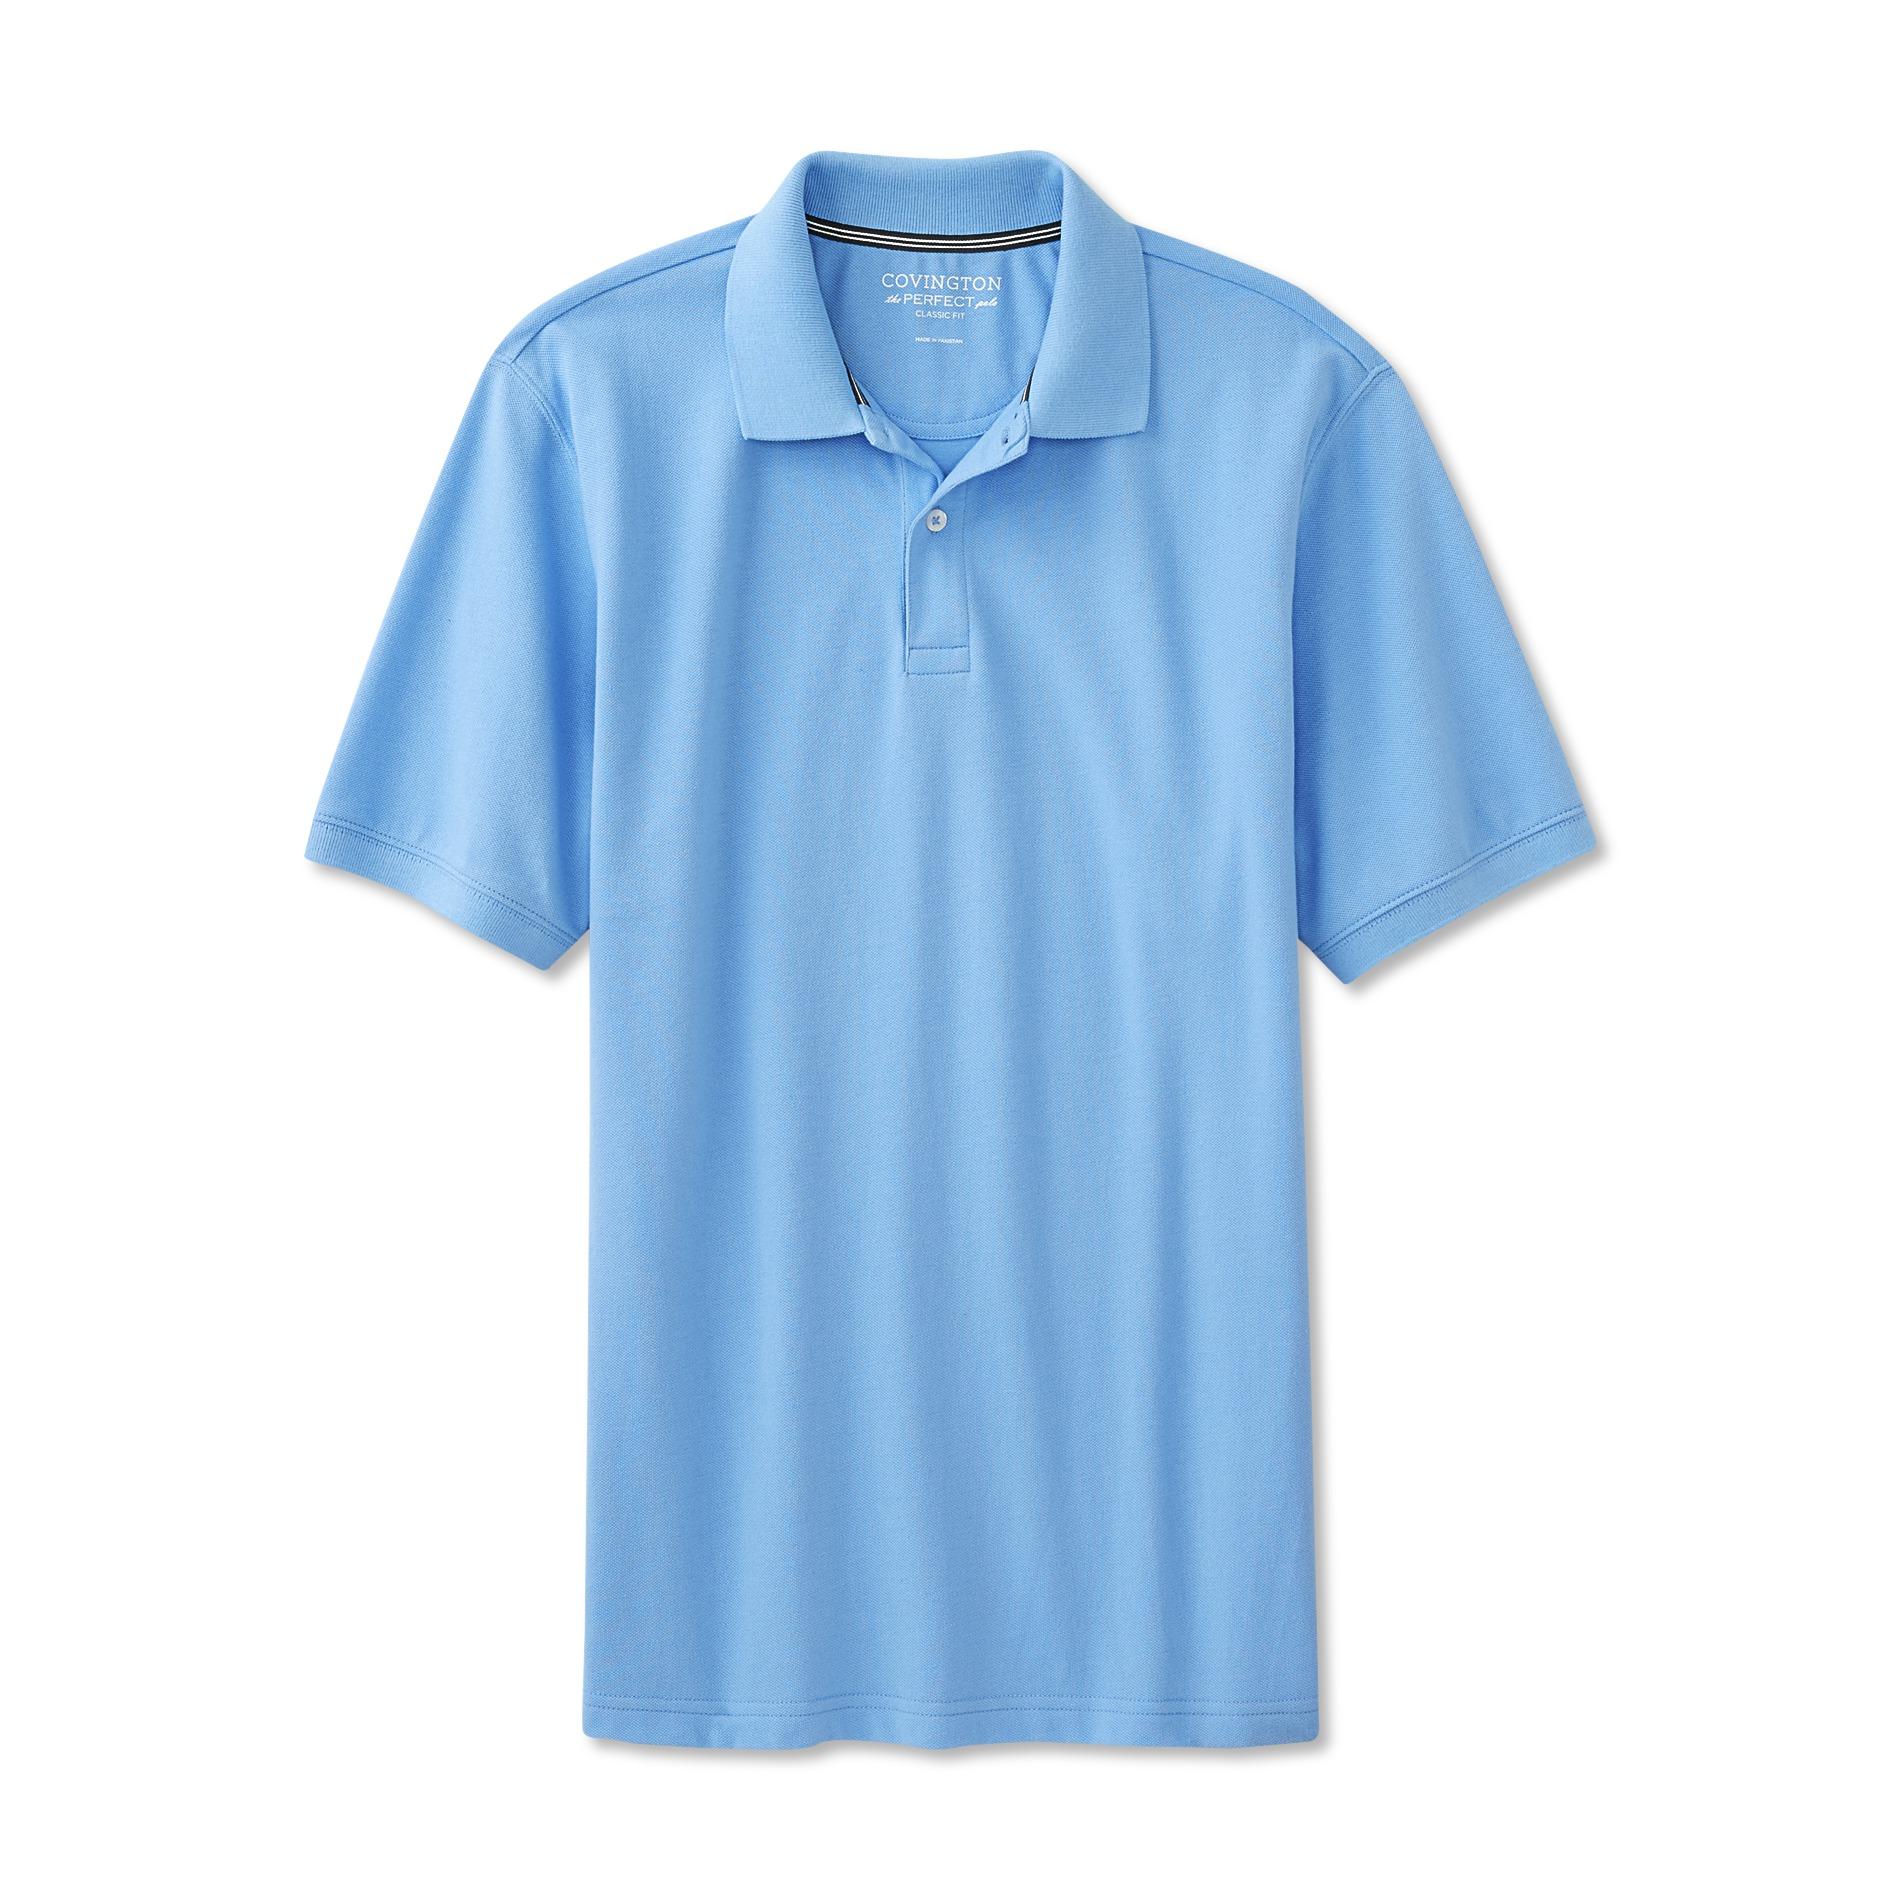 Covington Men's Big & Tall Classic Fit Polo Shirt